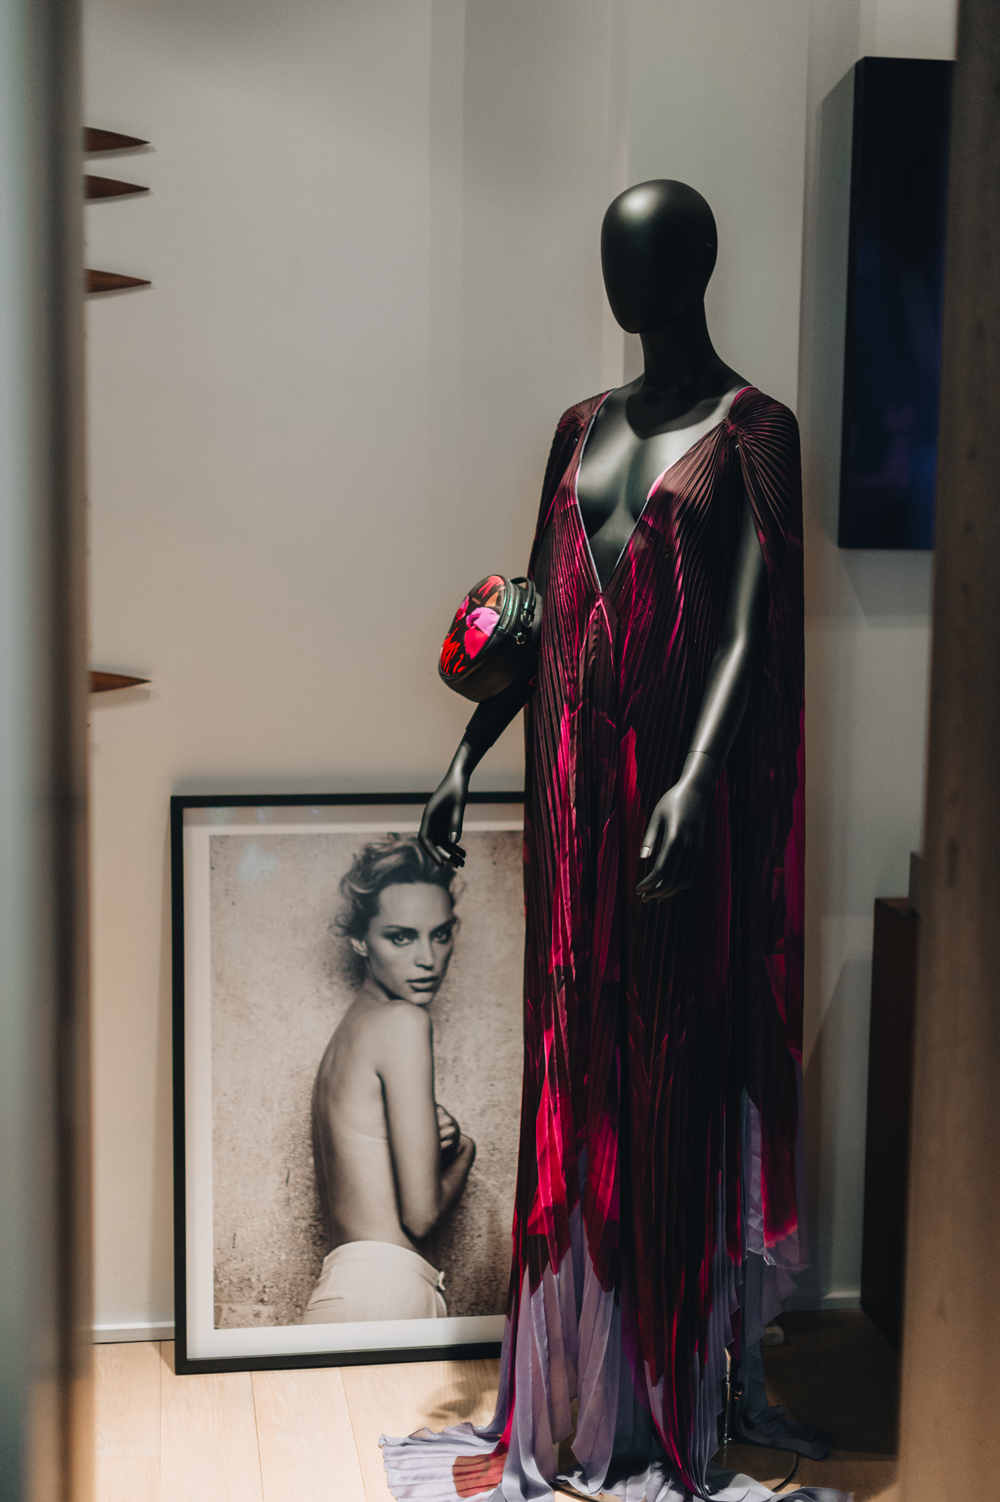 Photo of Inna taken by Peter Lindbergh and an Innangelo kaftan on the mannequin